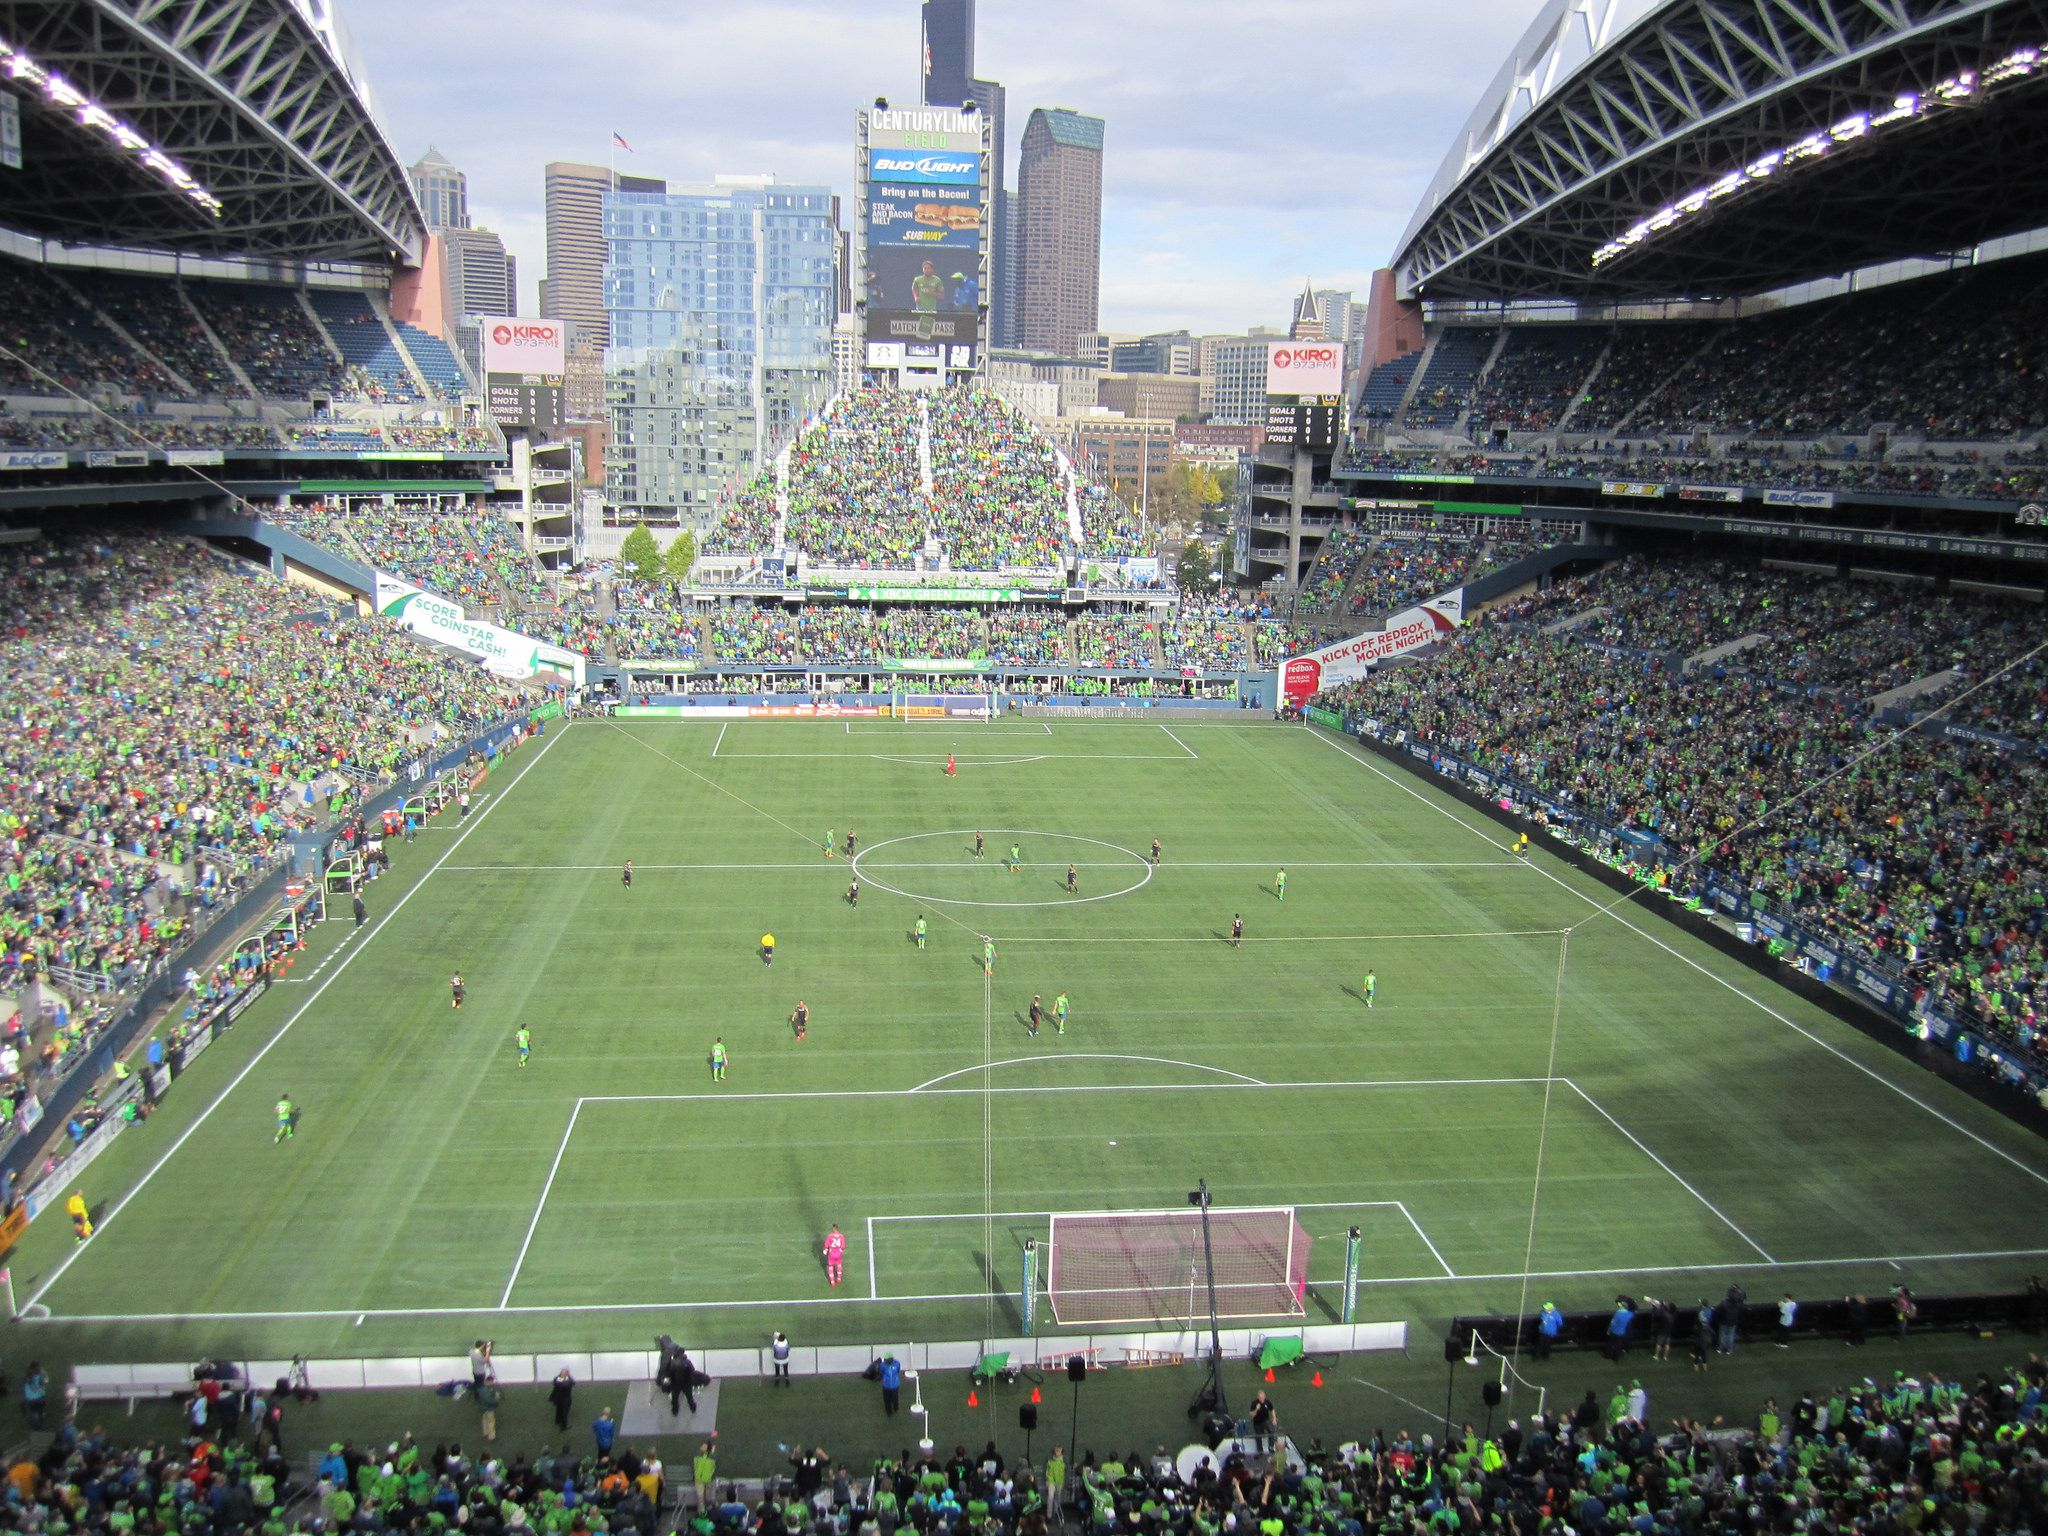 South Tacoma Auto >> Pro Sports Teams in Seattle and Tacoma